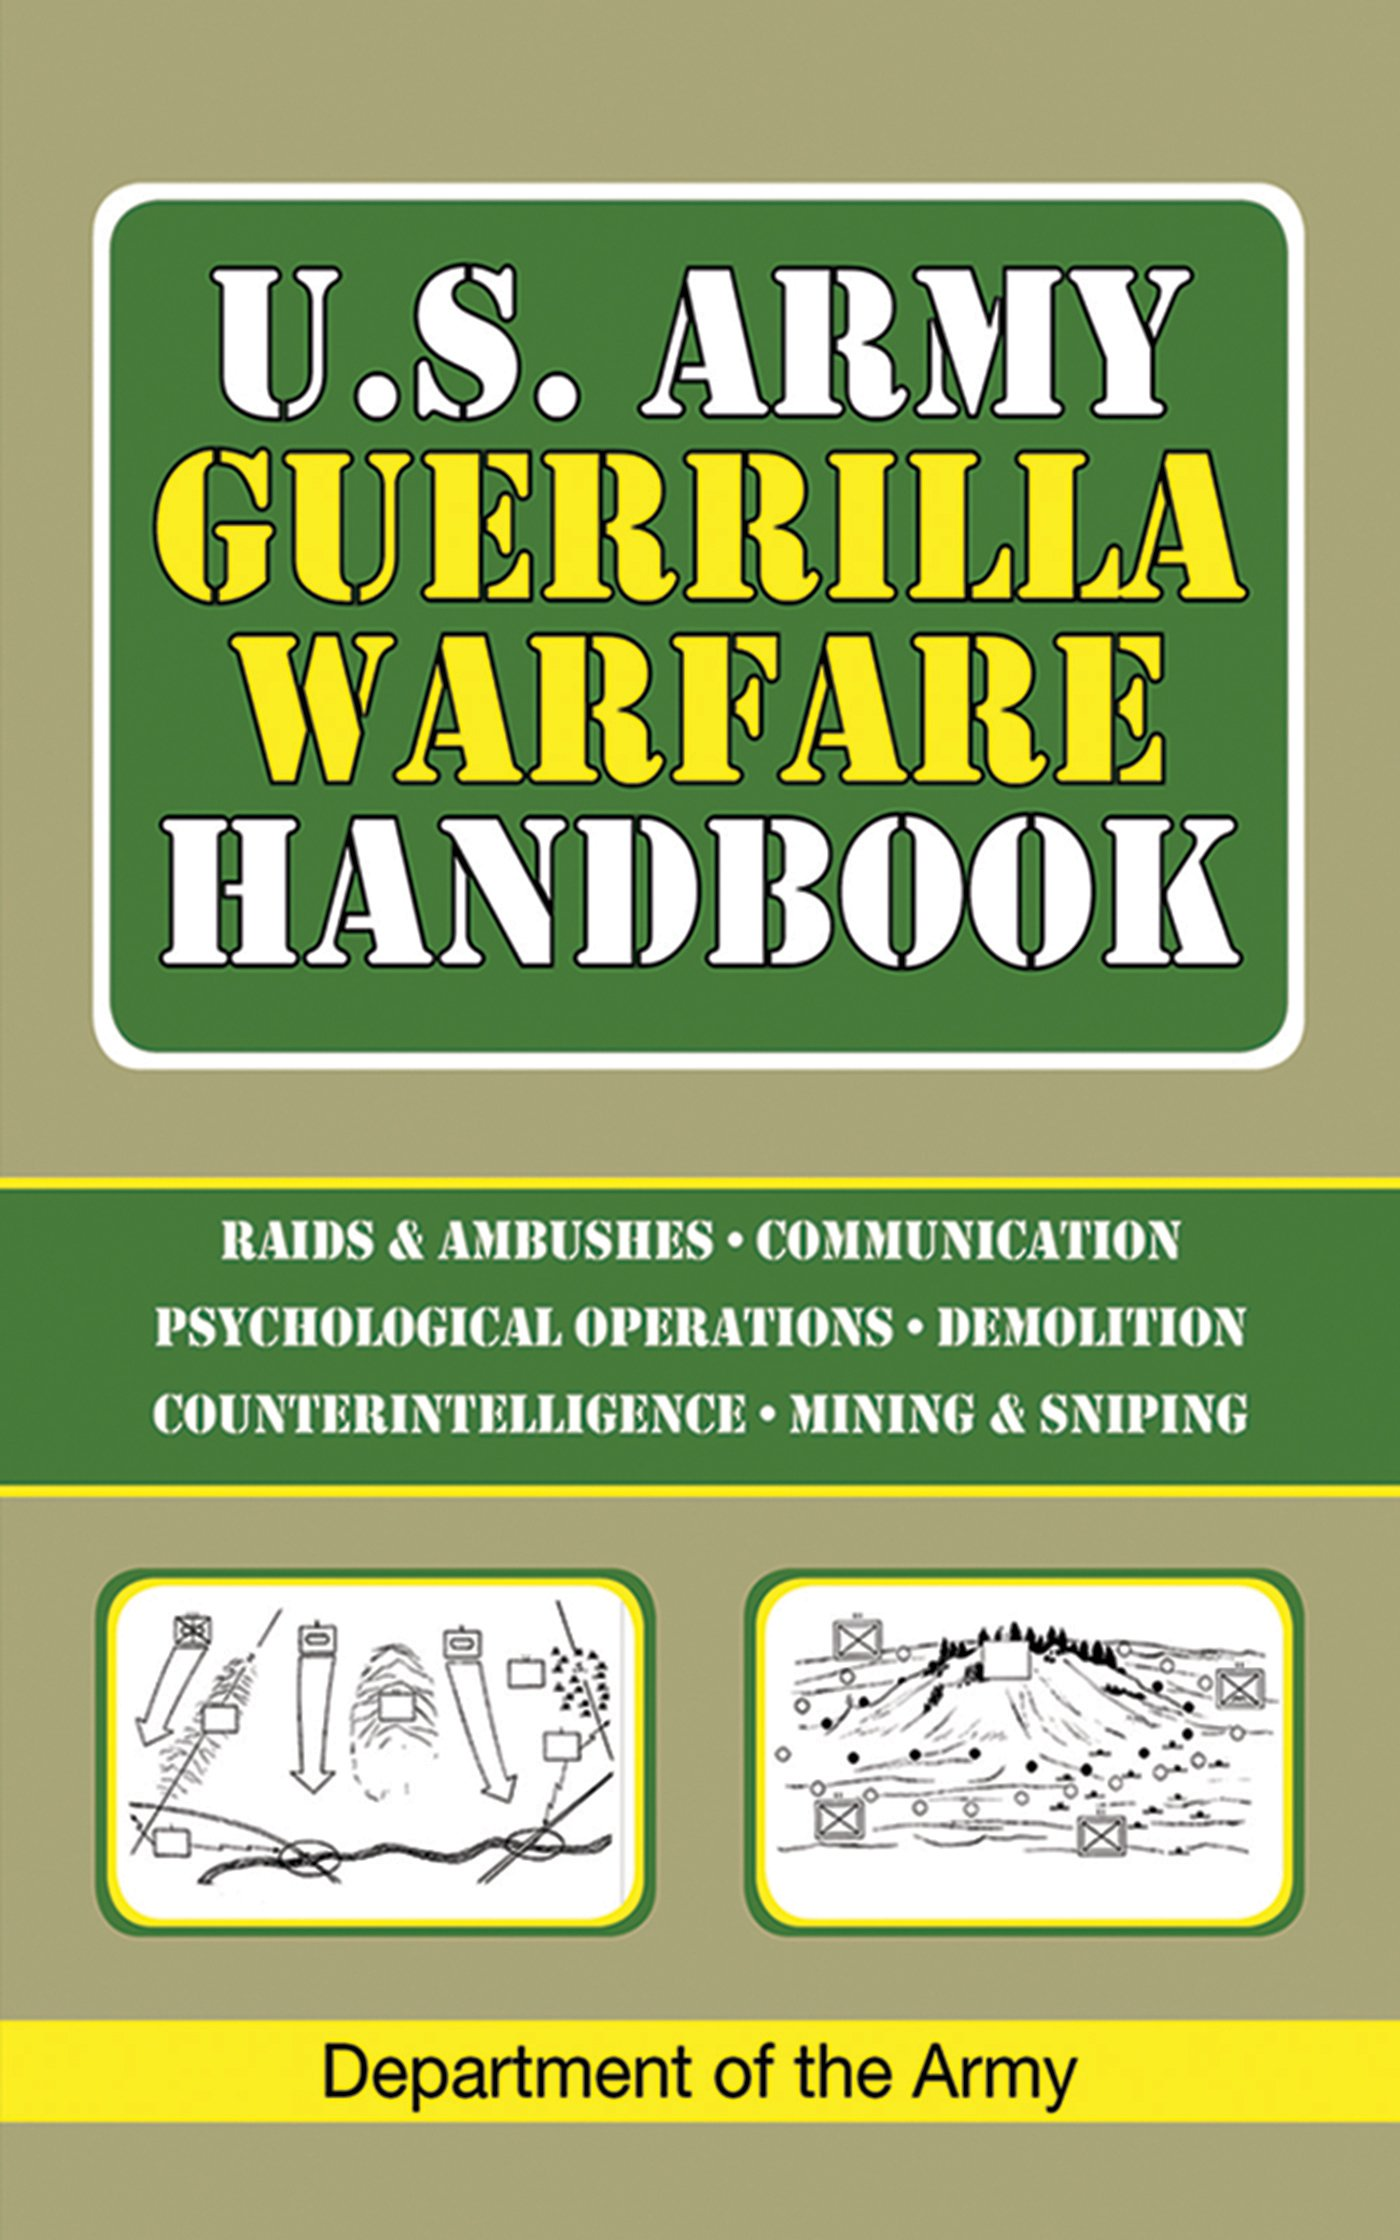 U S Army Guerrilla Warfare Handbook product image